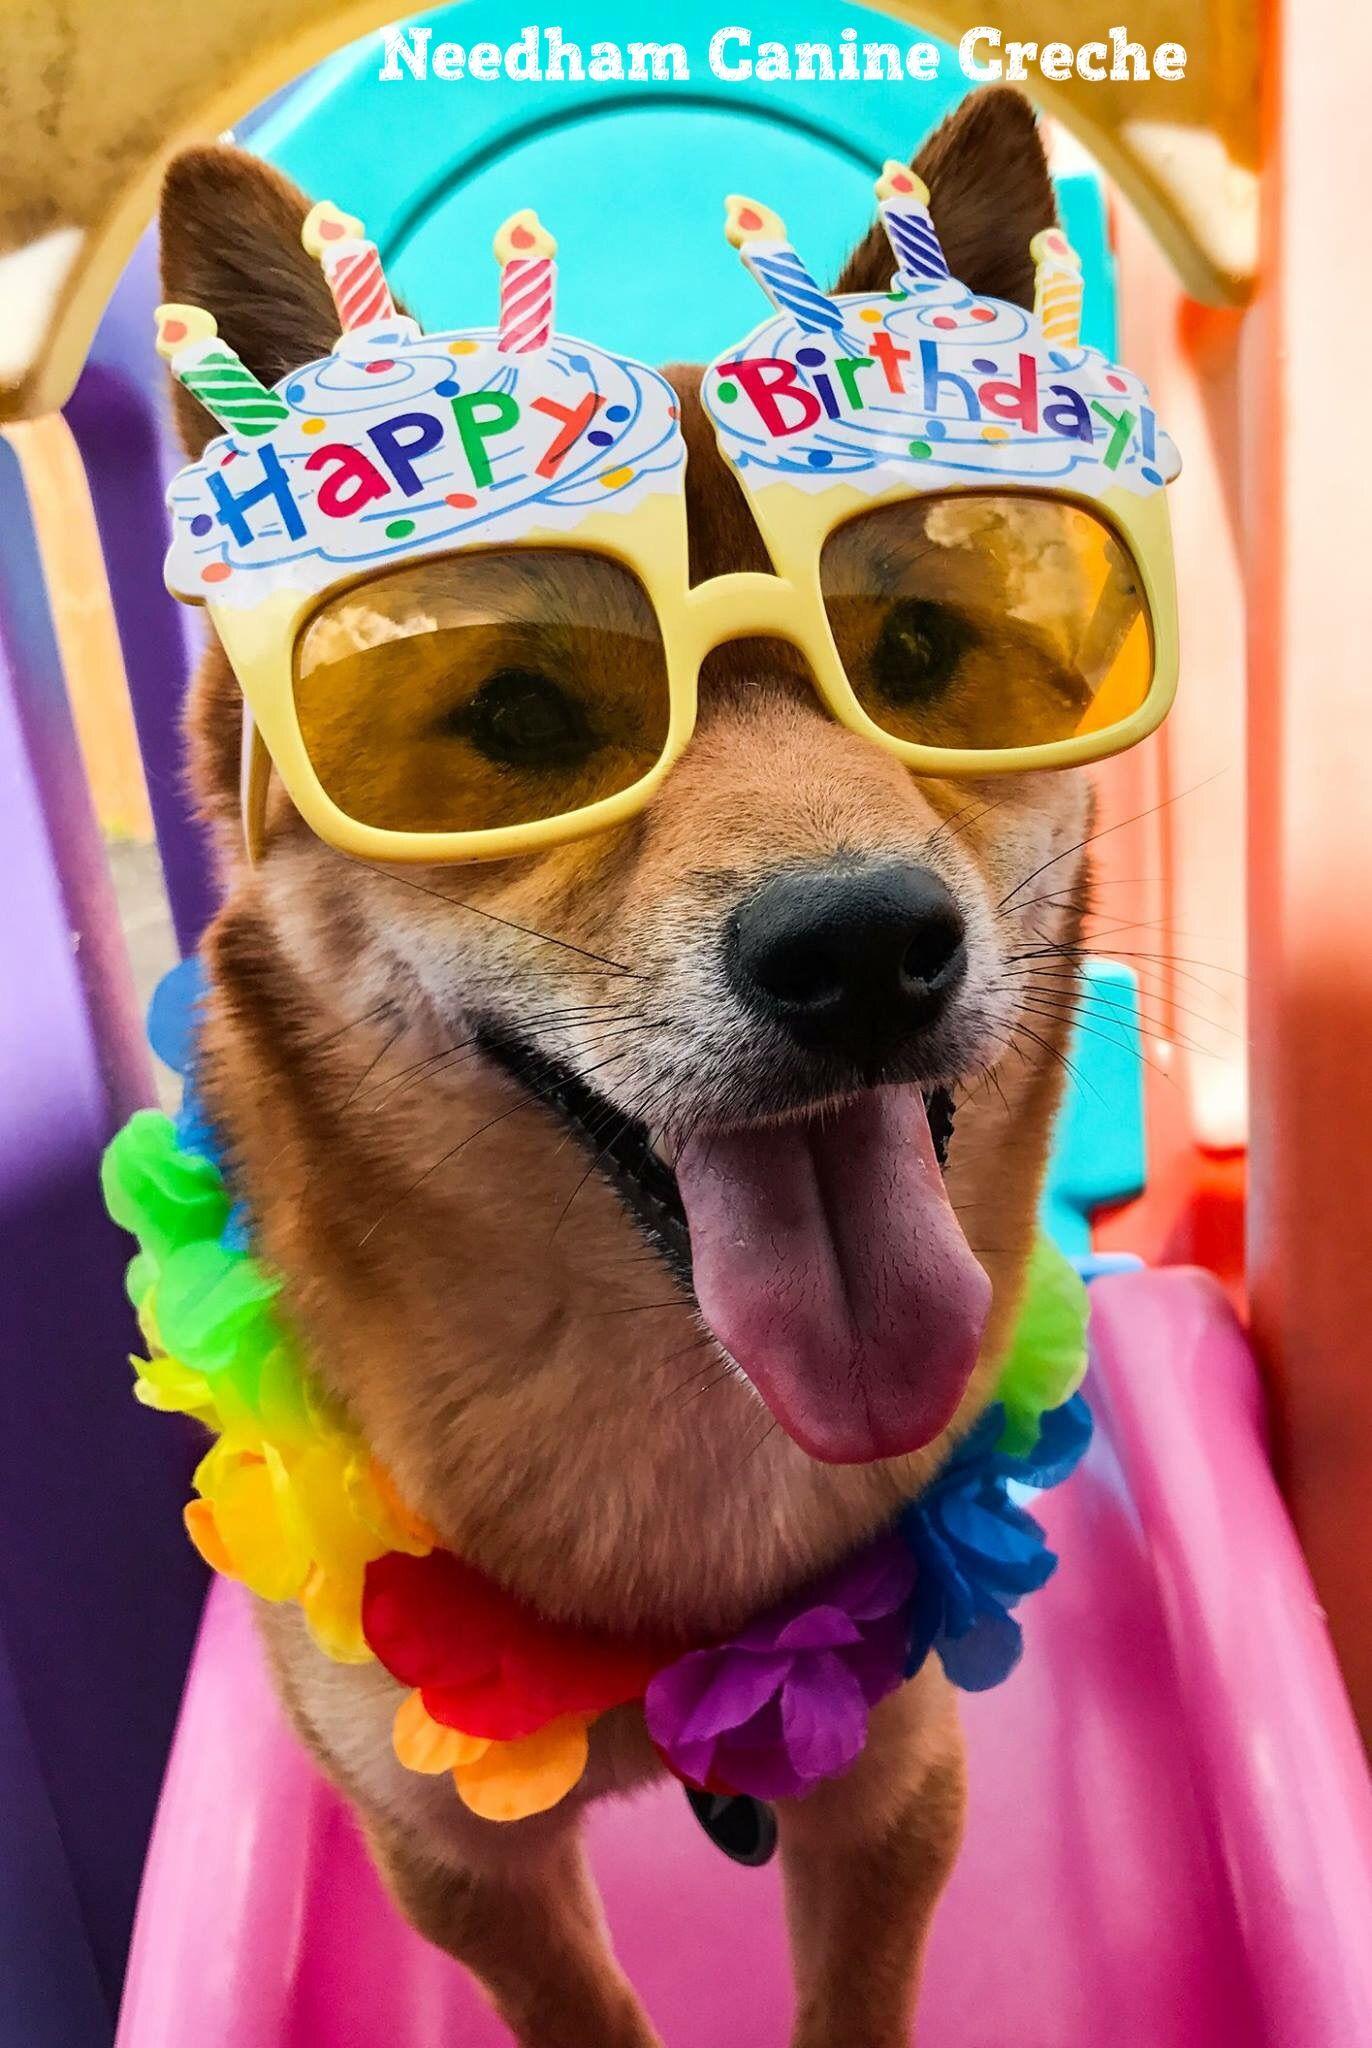 14 Dog Birthday Cake  Cupcake Homemade Recipes Playbarkrun